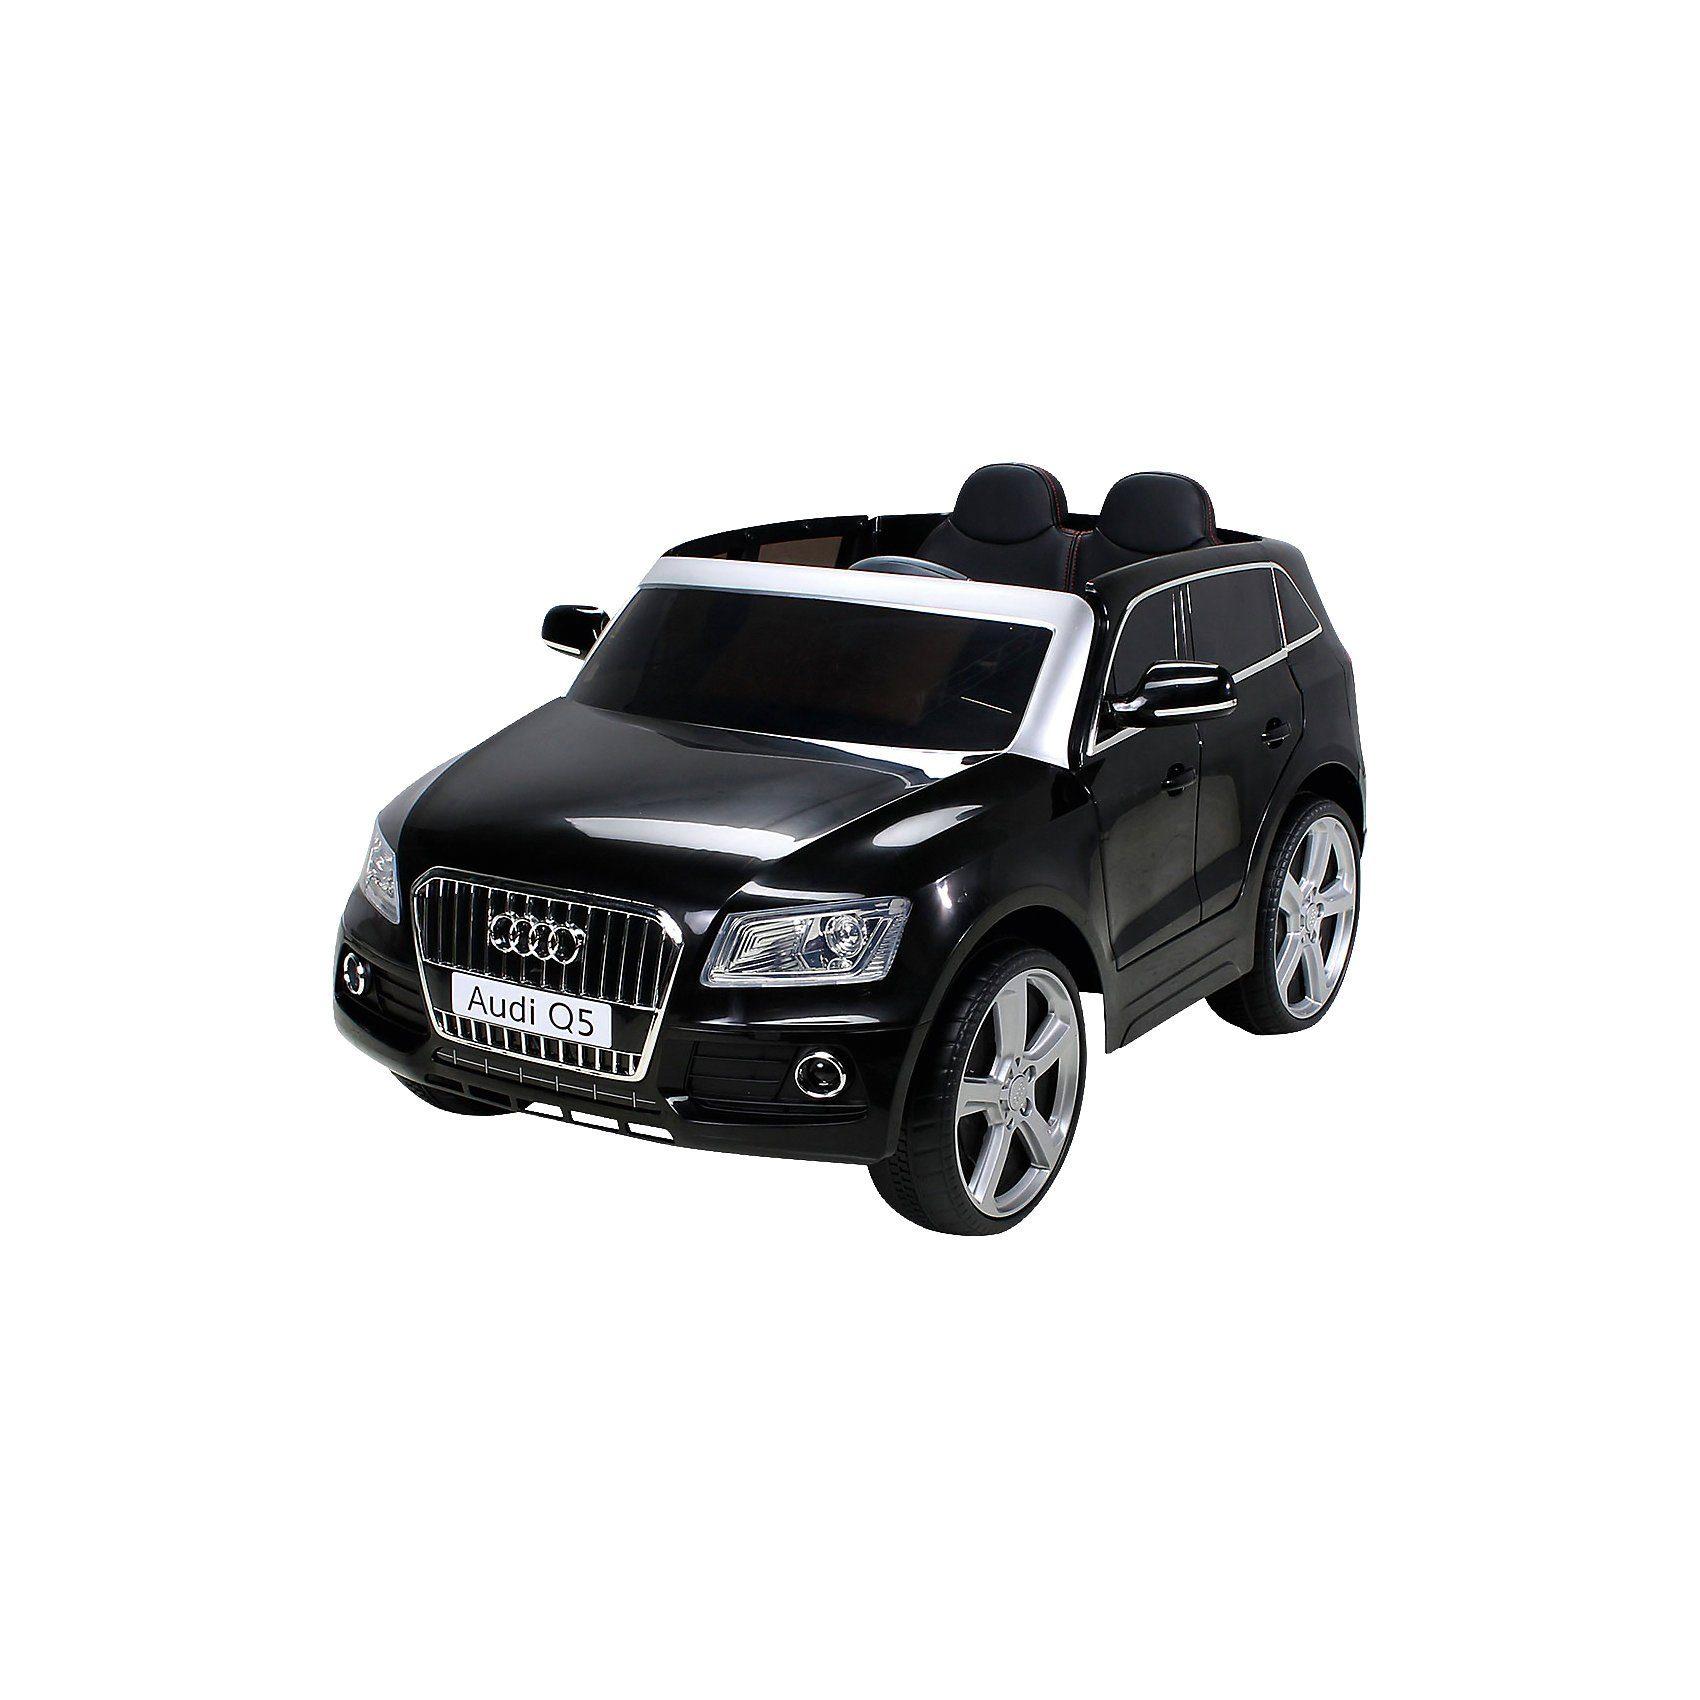 miweba Kinder Elektroauto Audi Q5 SUV Lizenziert, schwarz